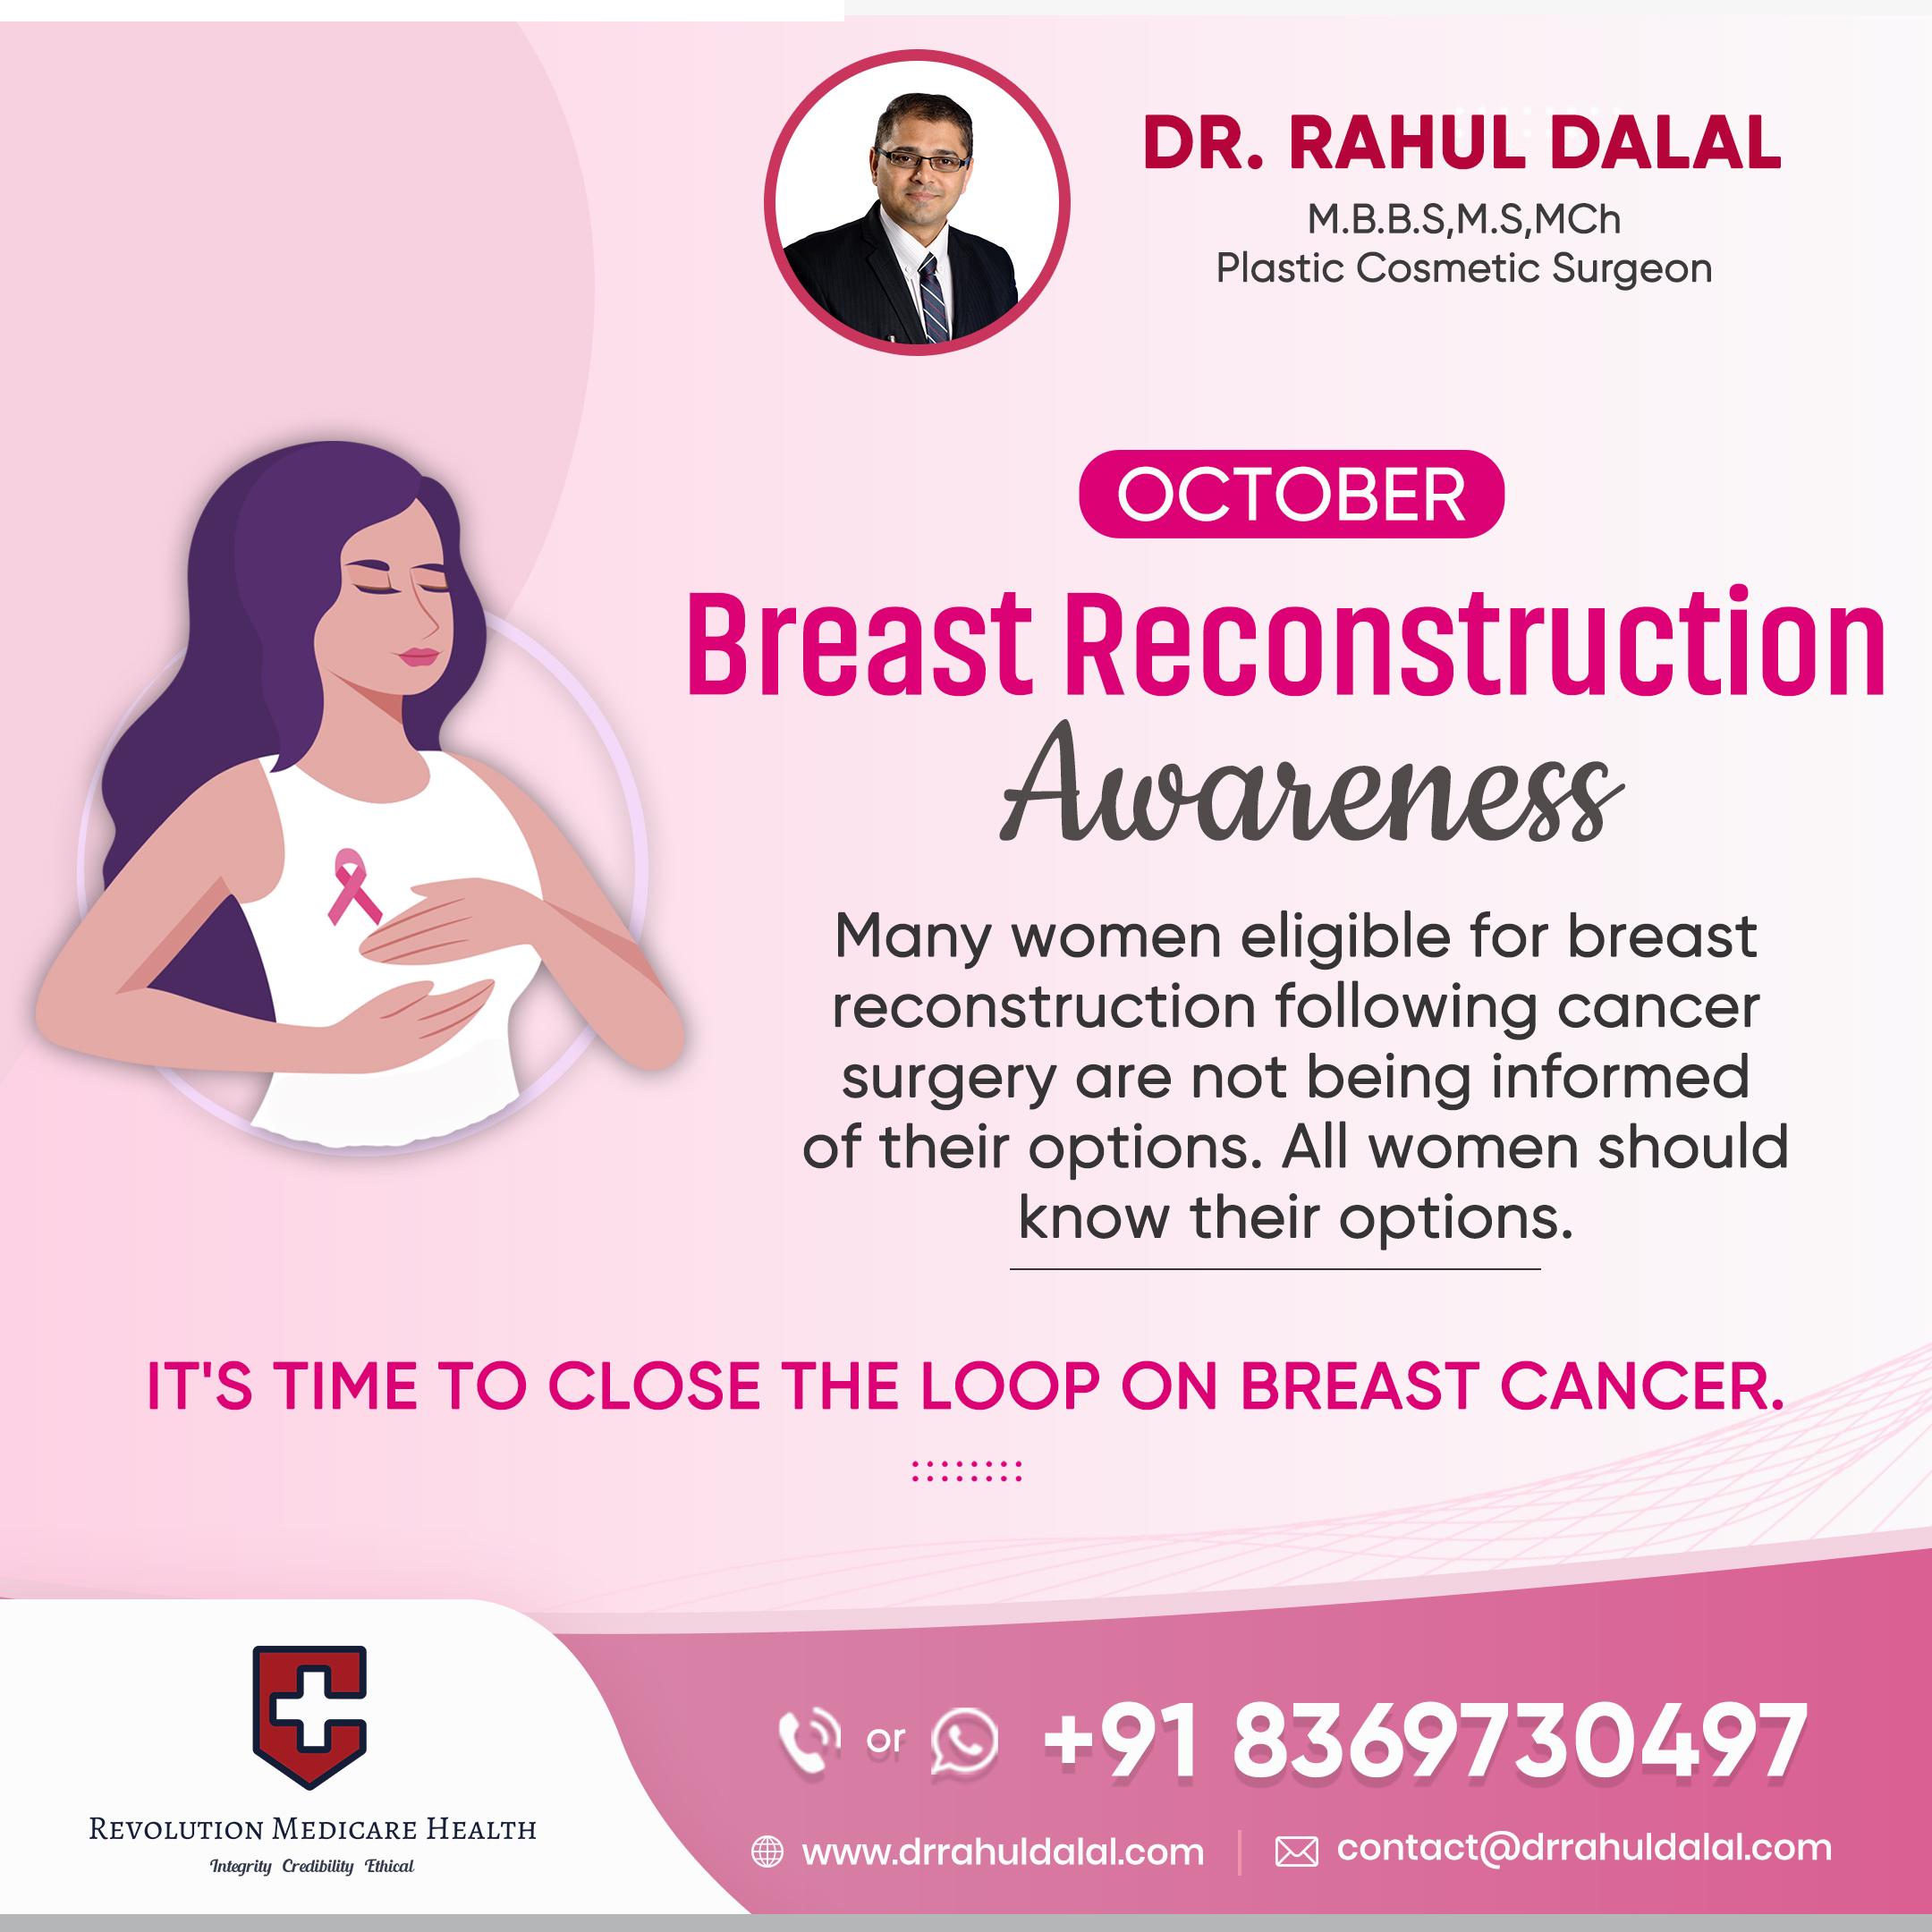 Breast Reconstruction Awareness